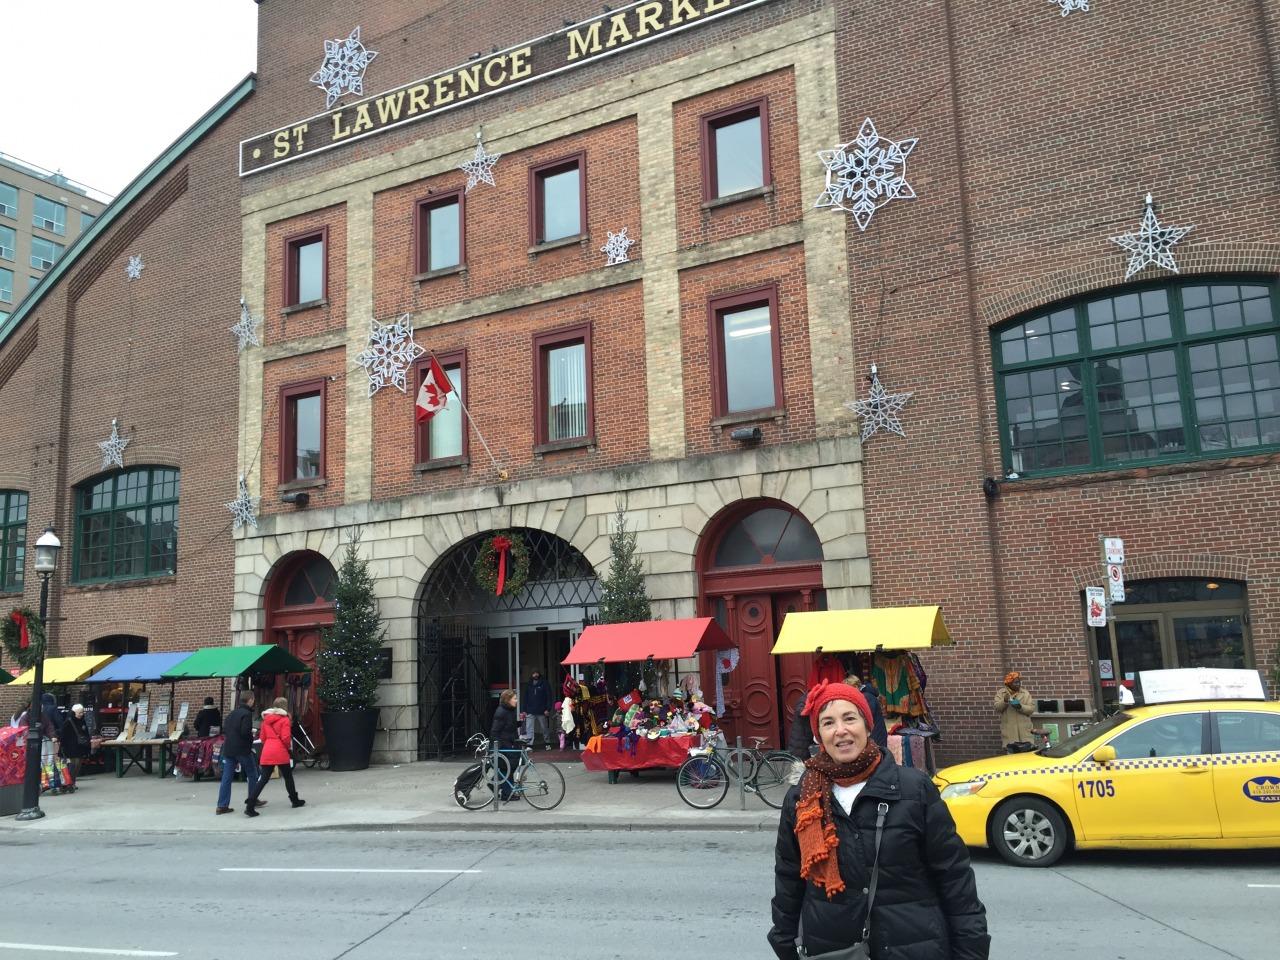 Lawrence Market